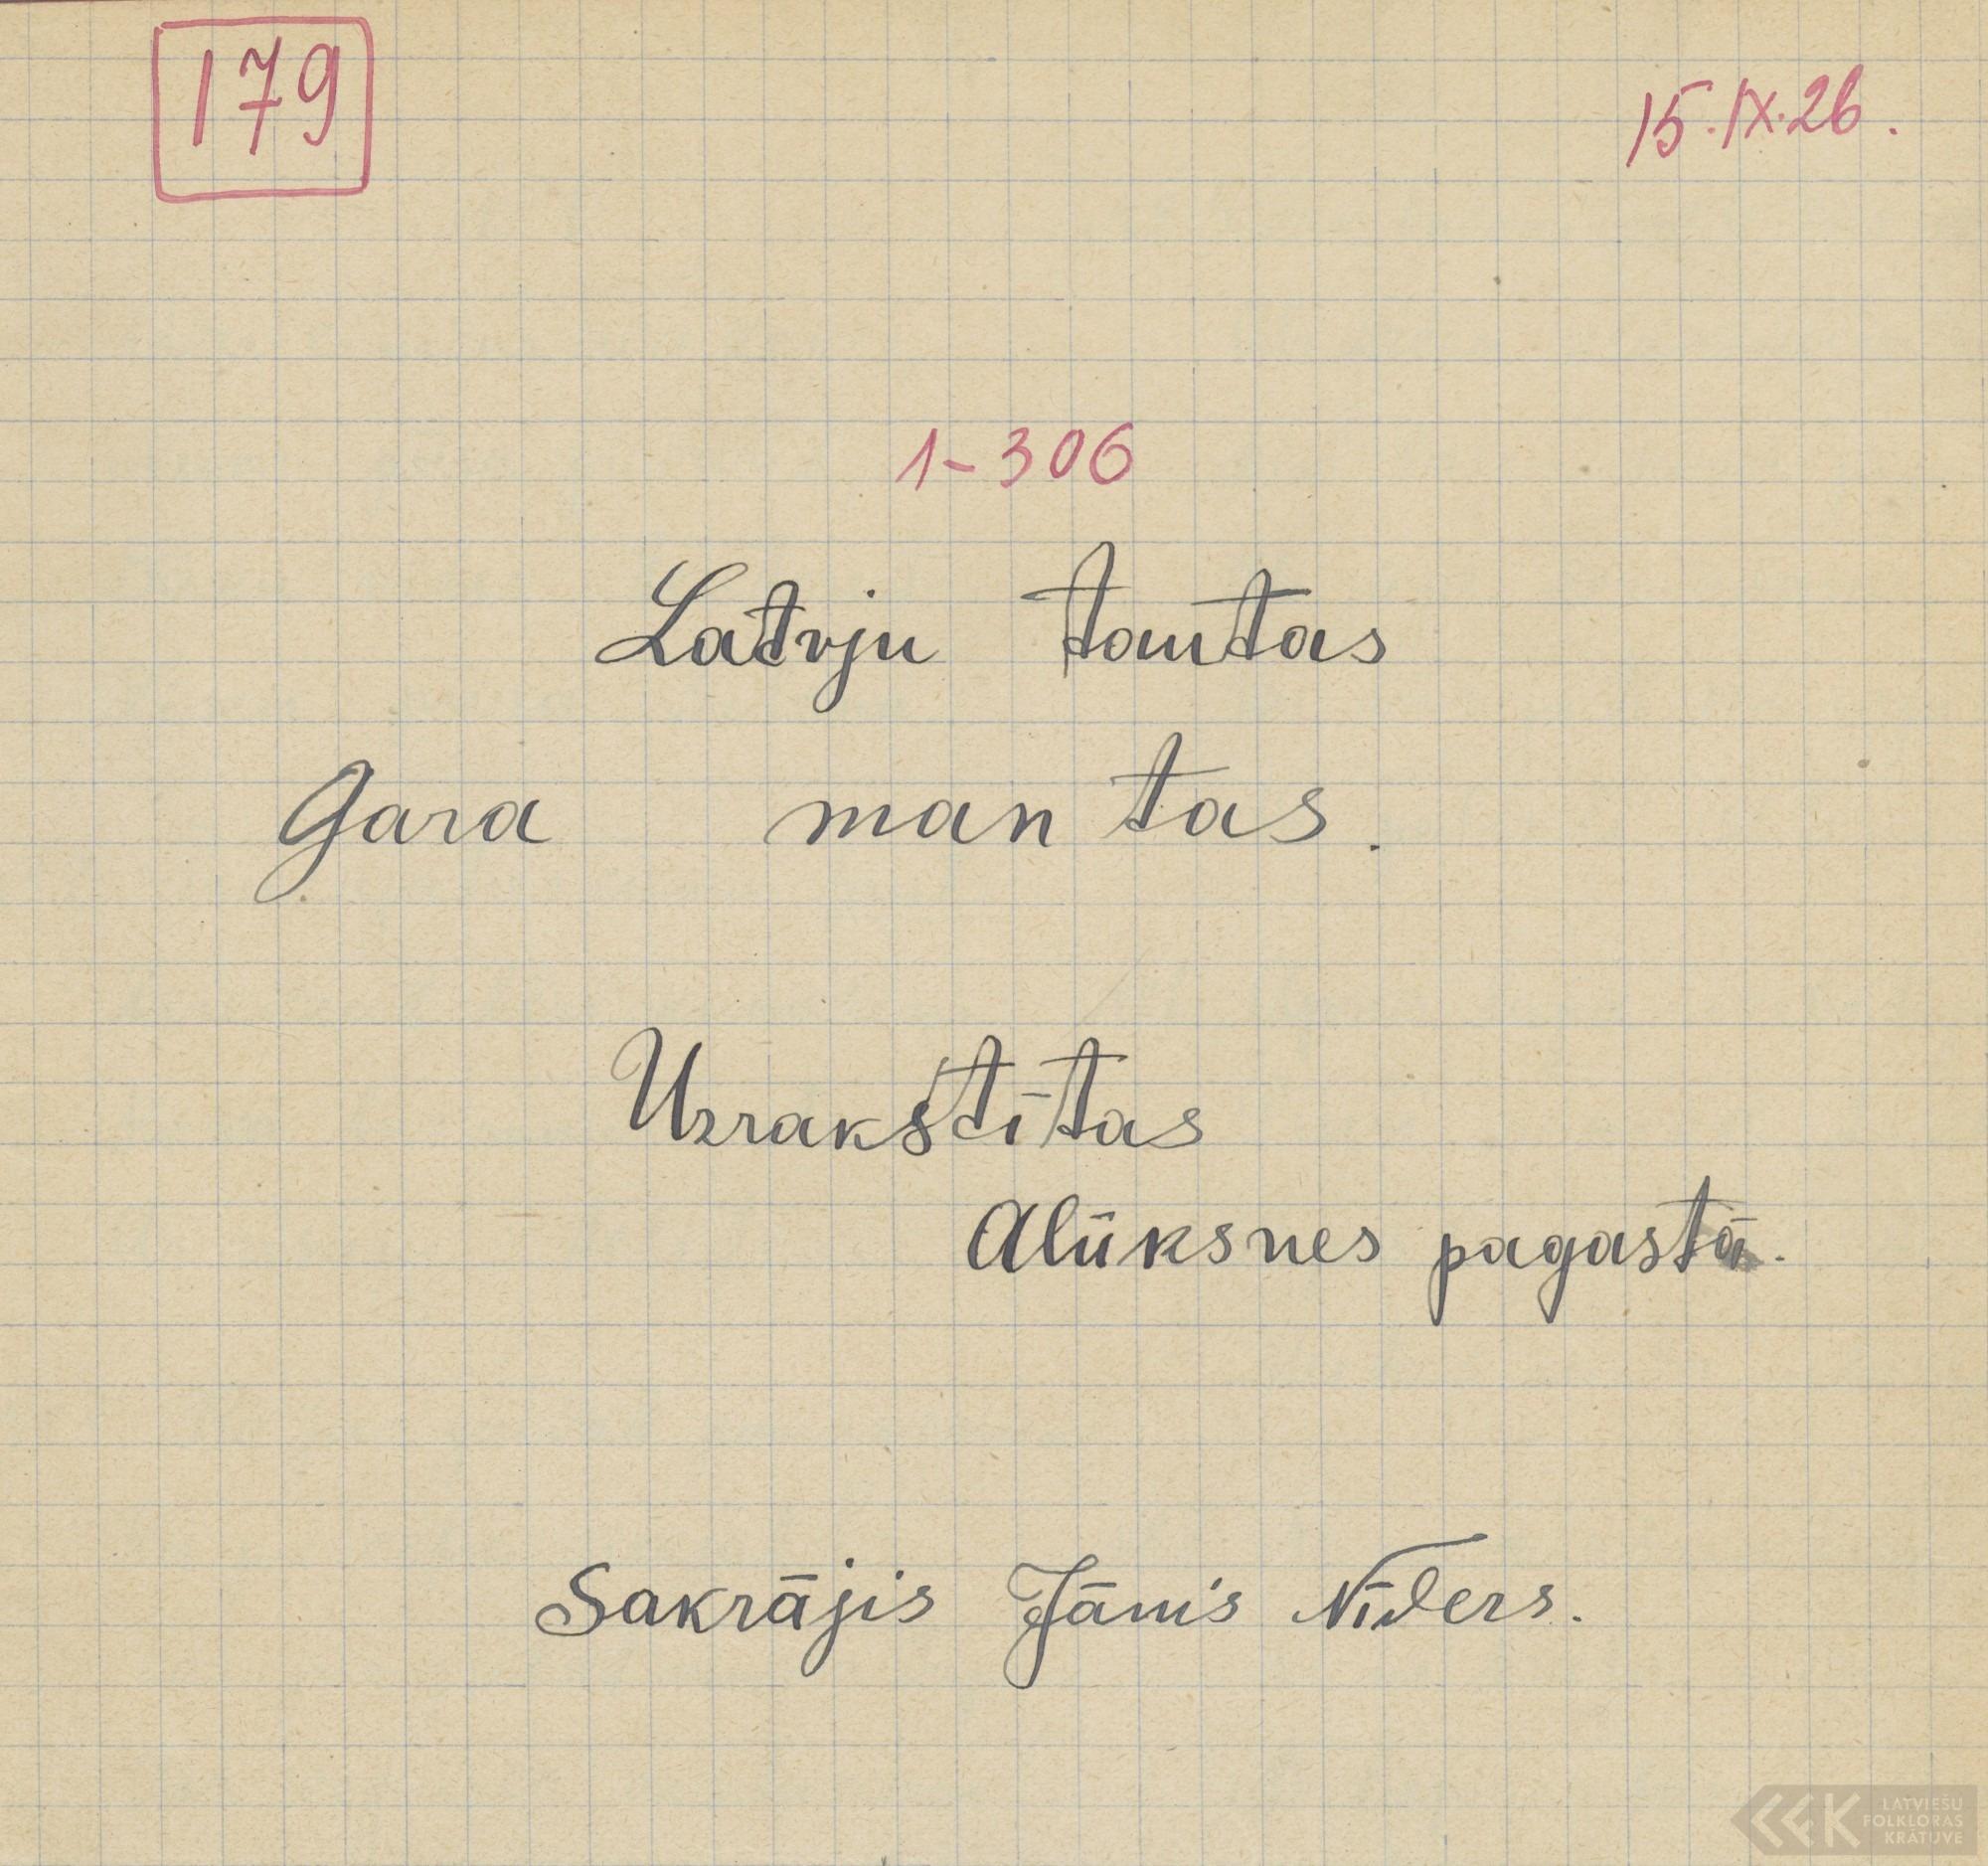 0179-Nidera-vakums-01-0001